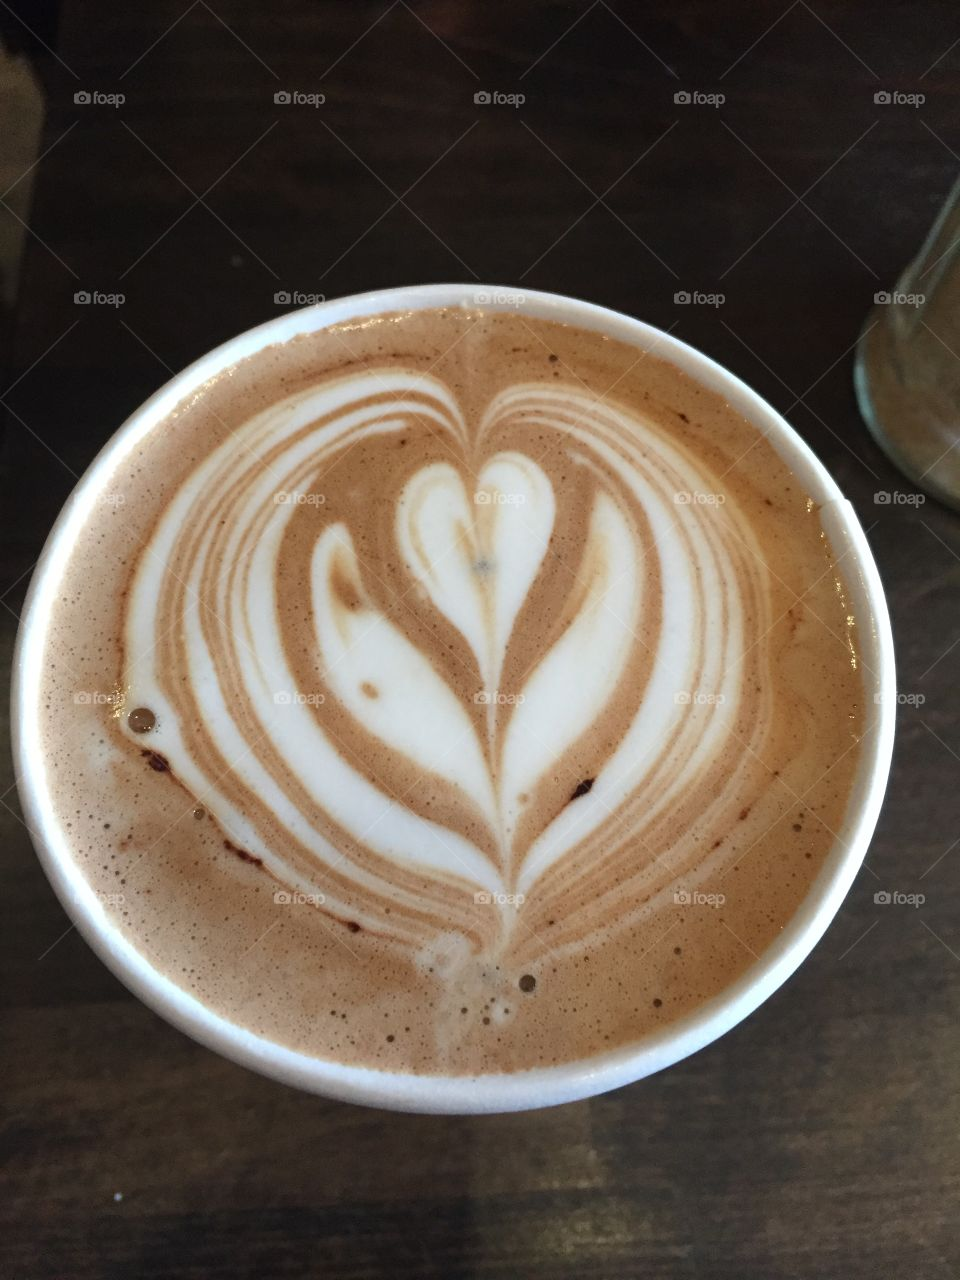 Mocha coffee with a heart swirl